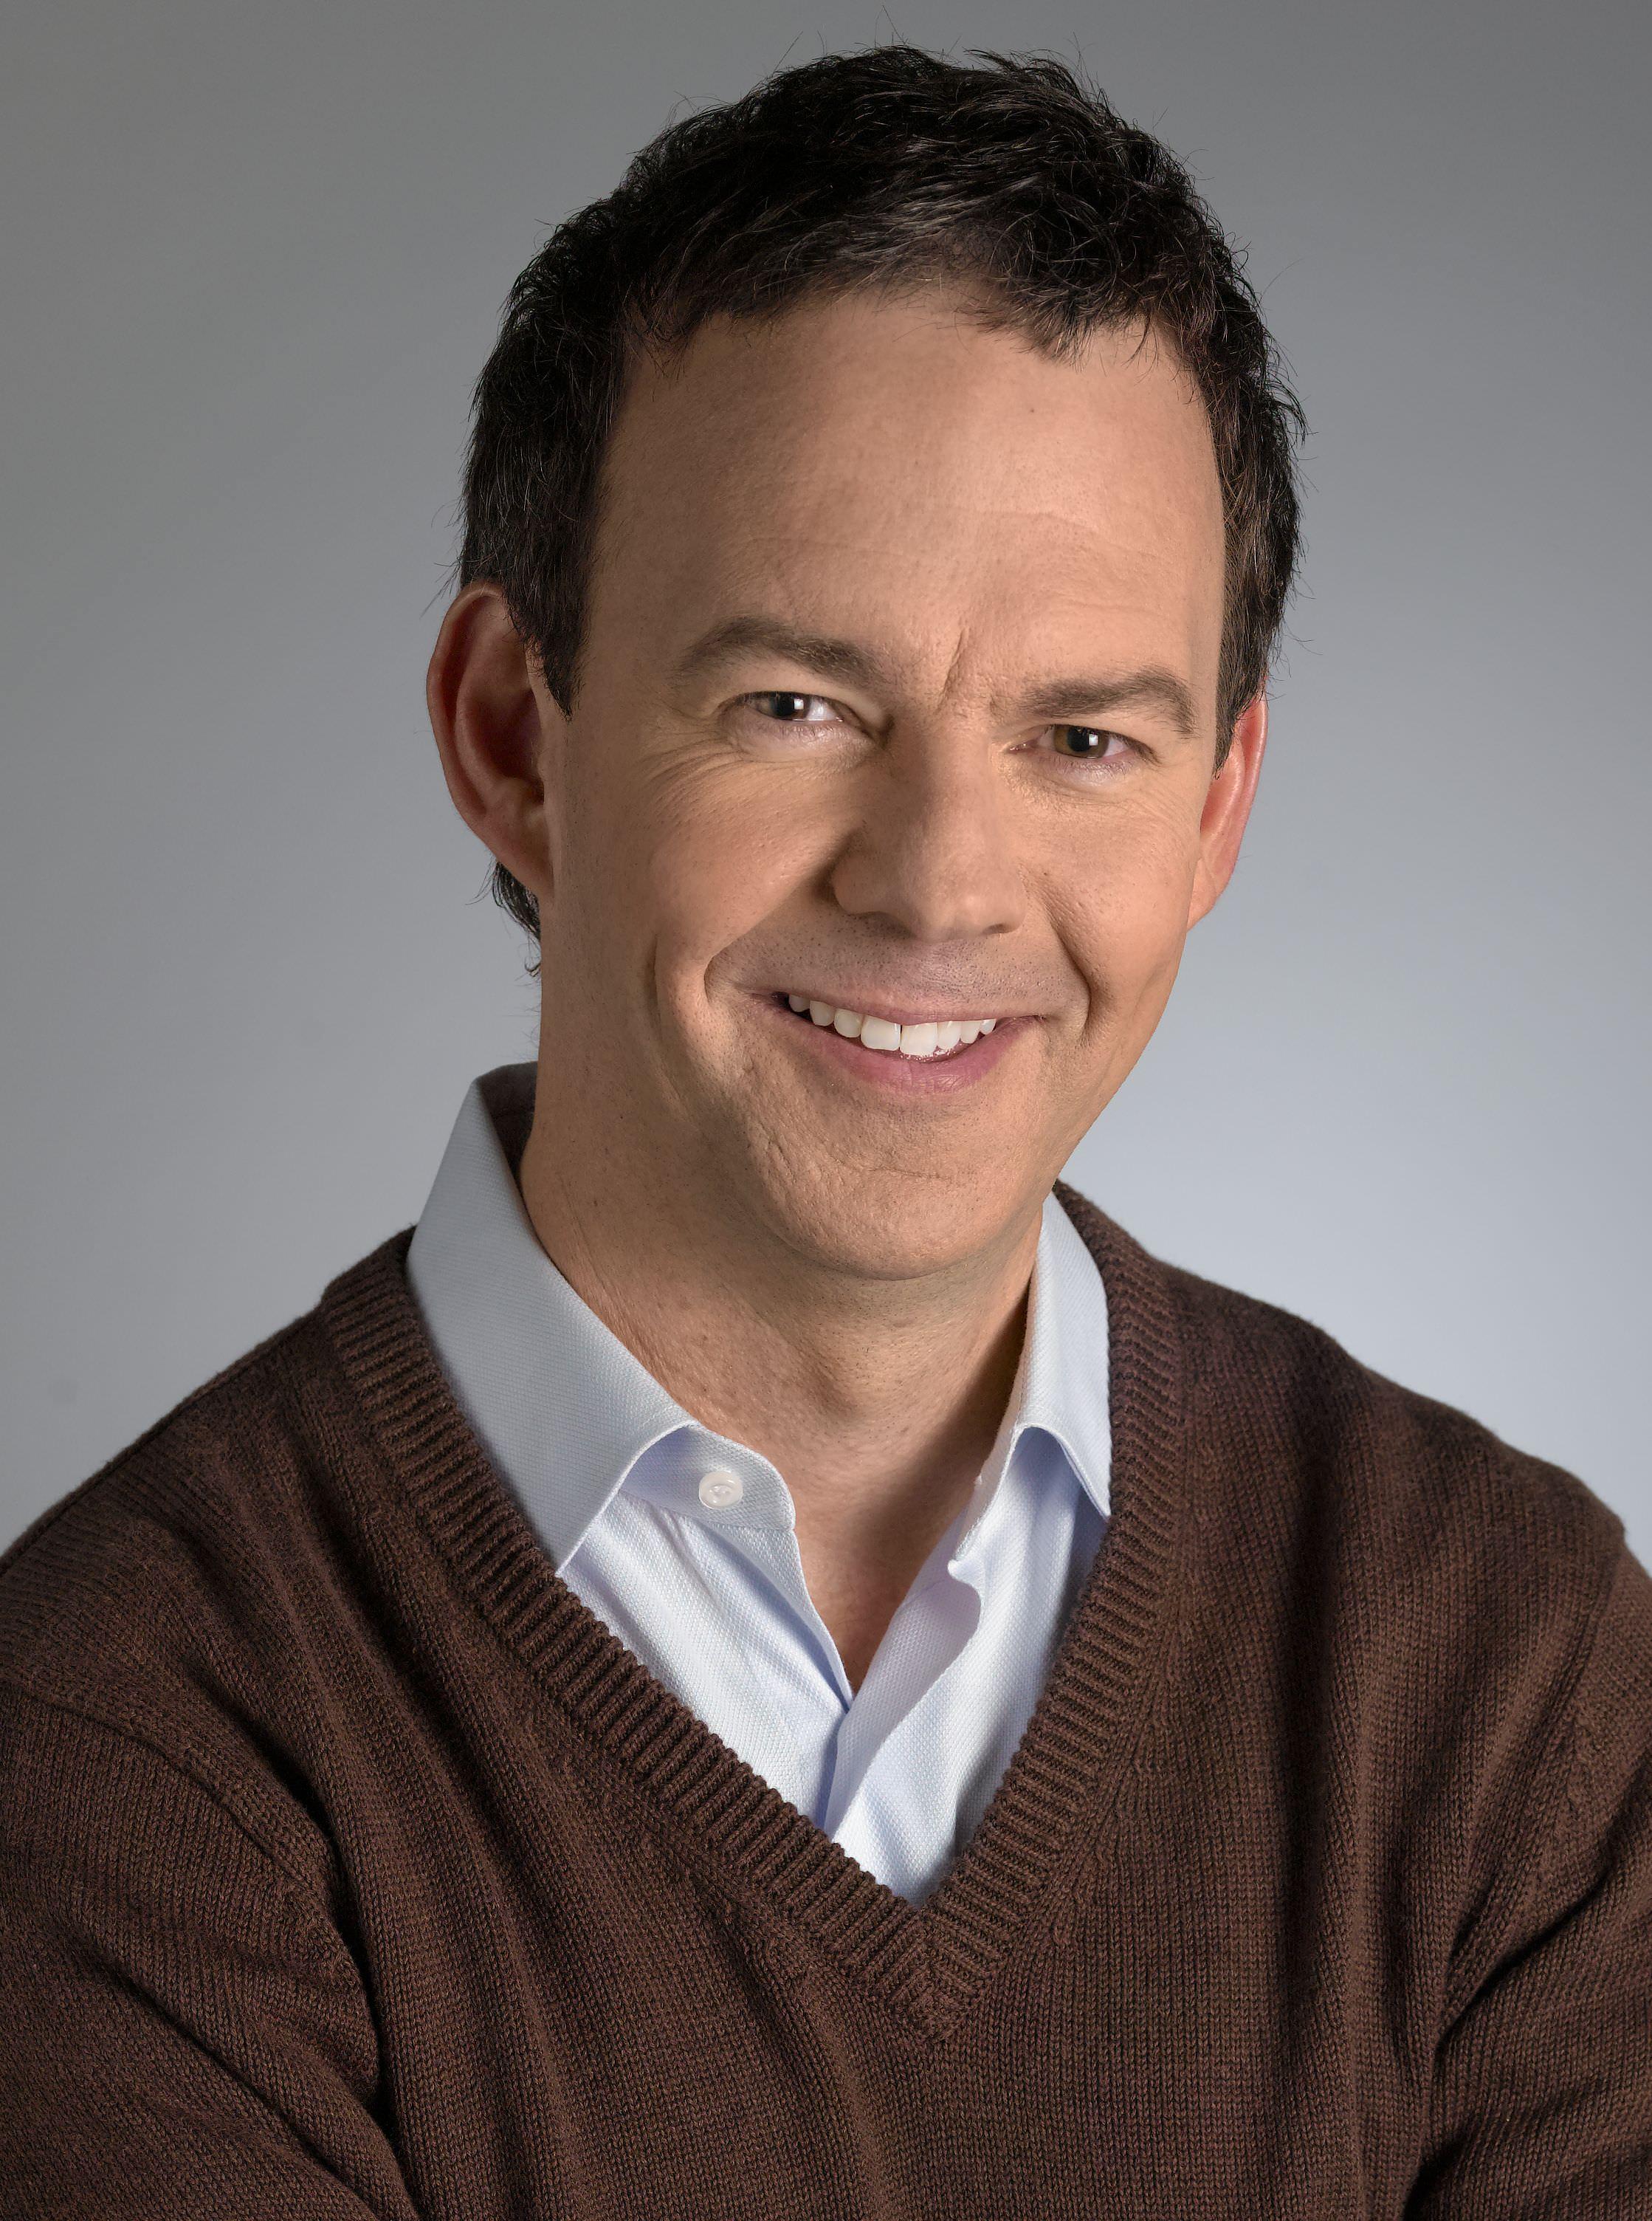 Tim Washer